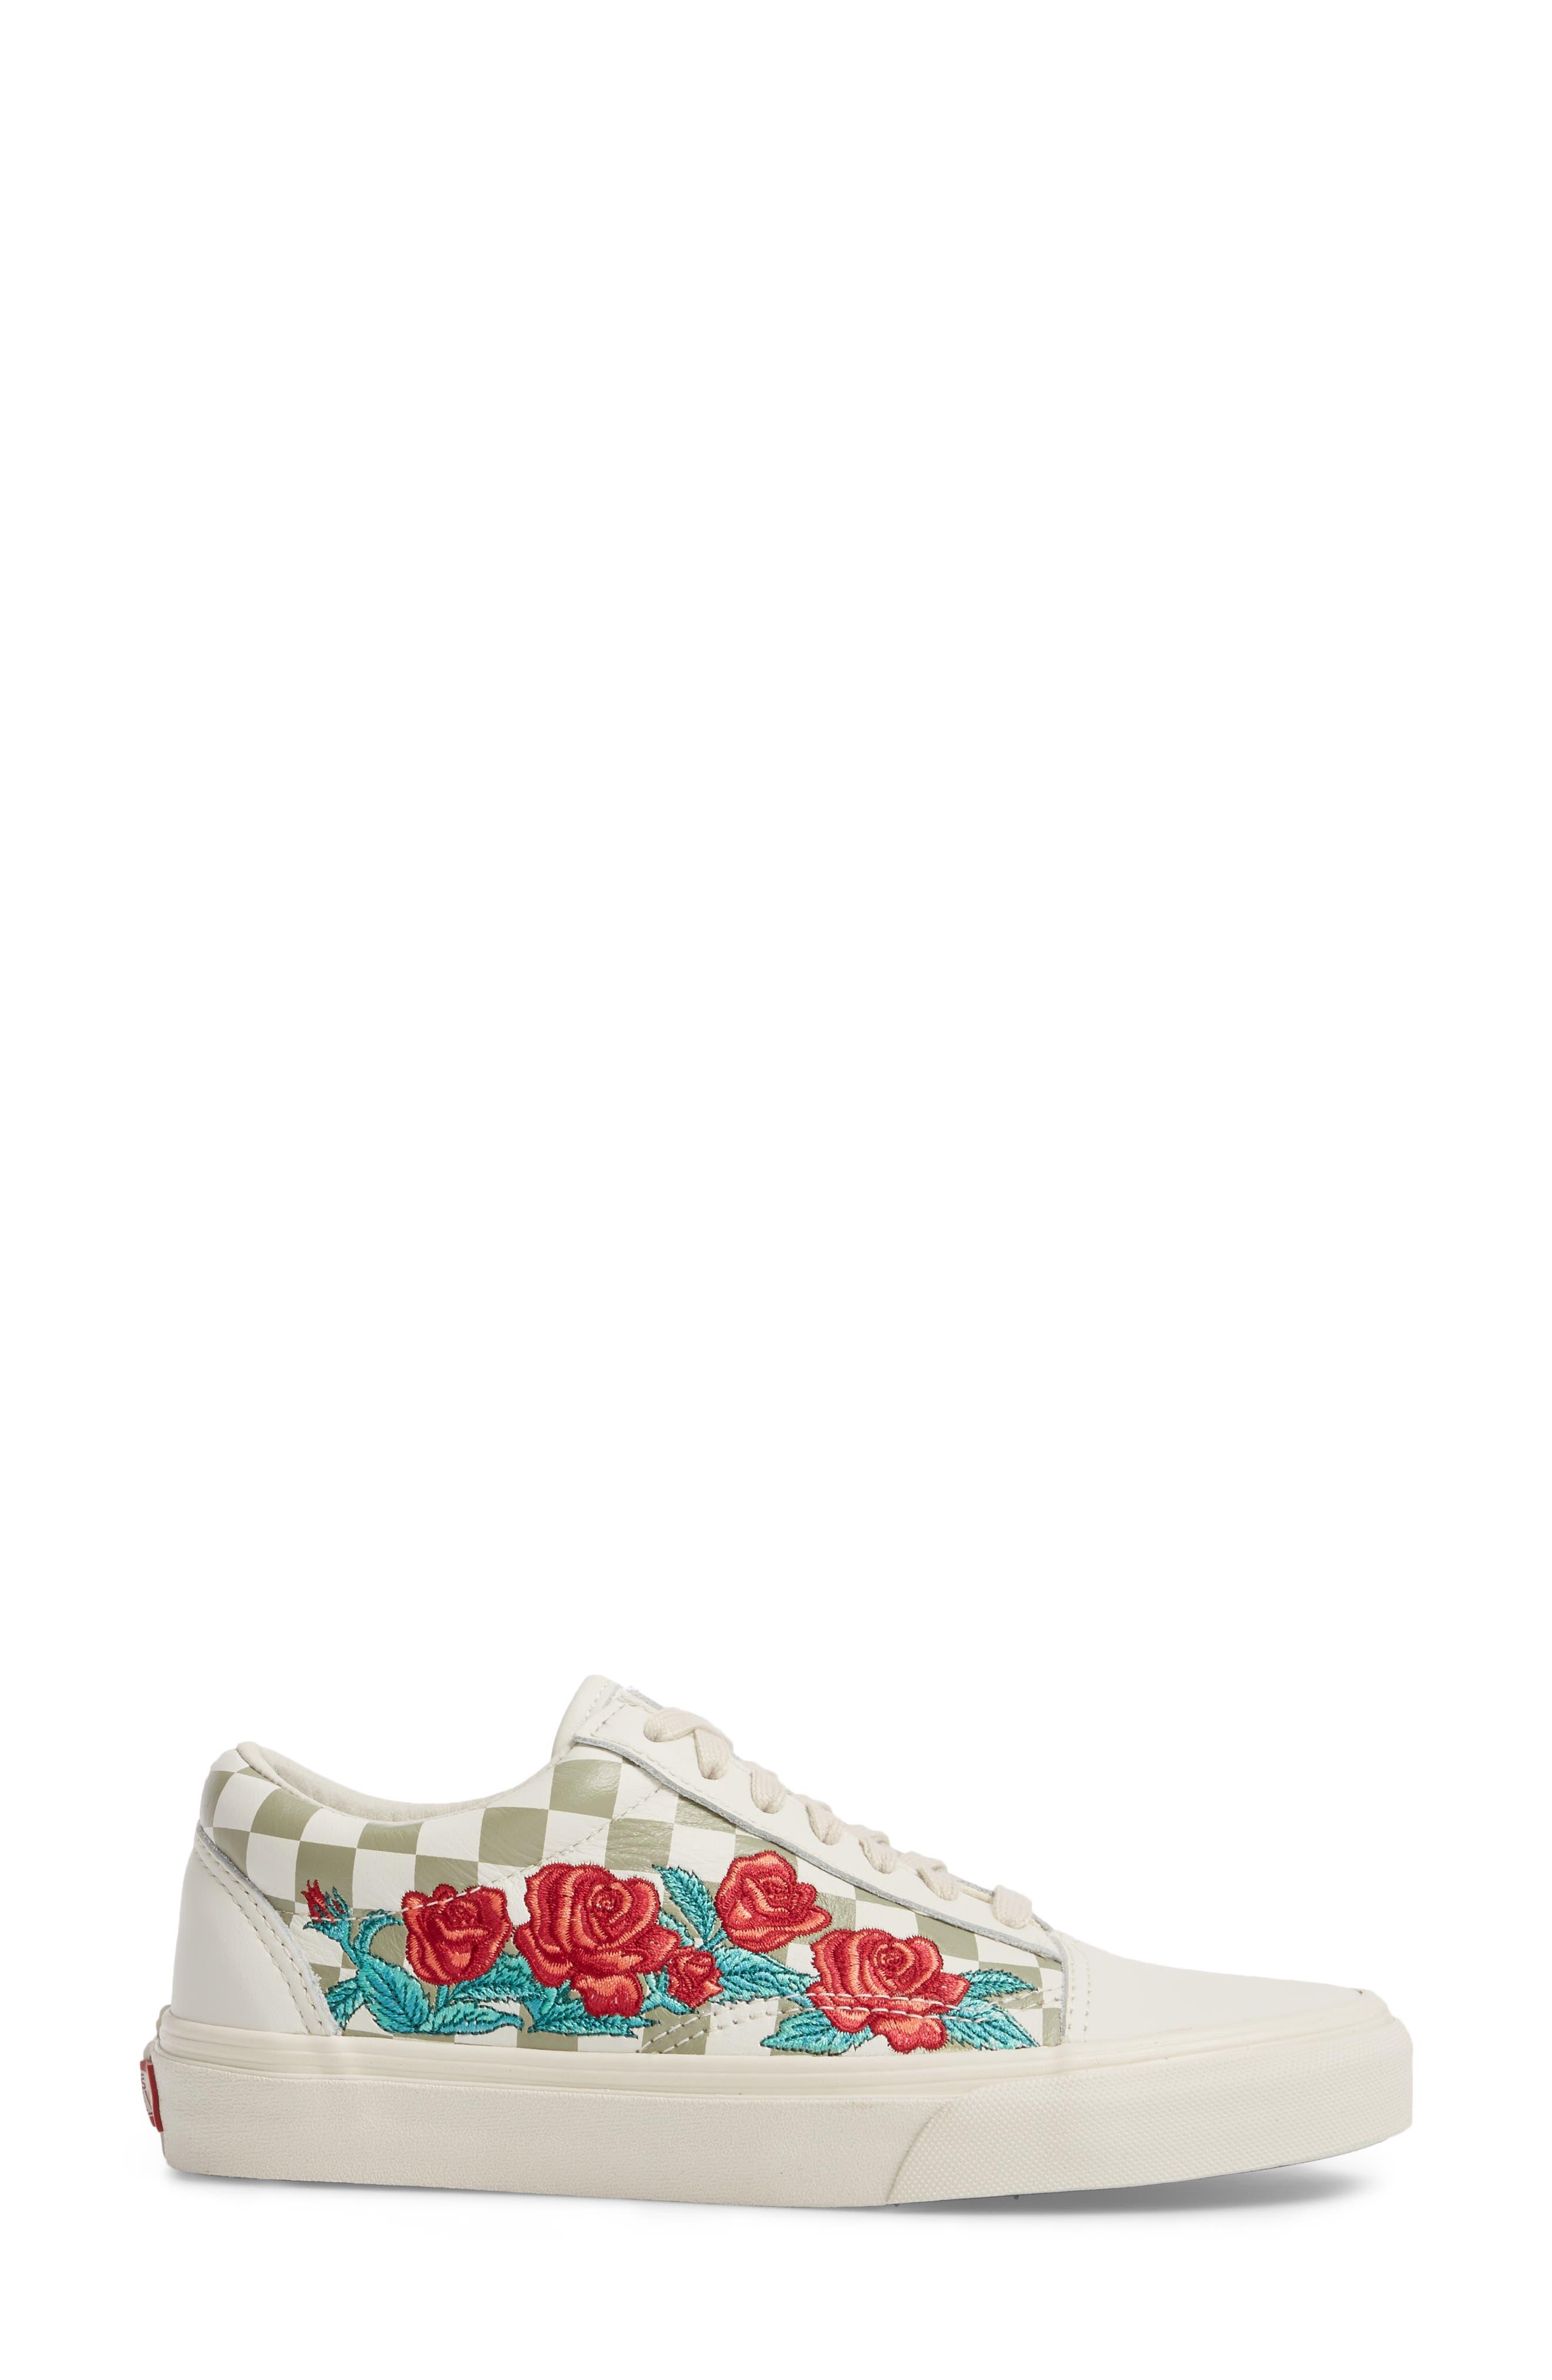 Old Skool 36 DX Sneaker,                             Alternate thumbnail 3, color,                             100